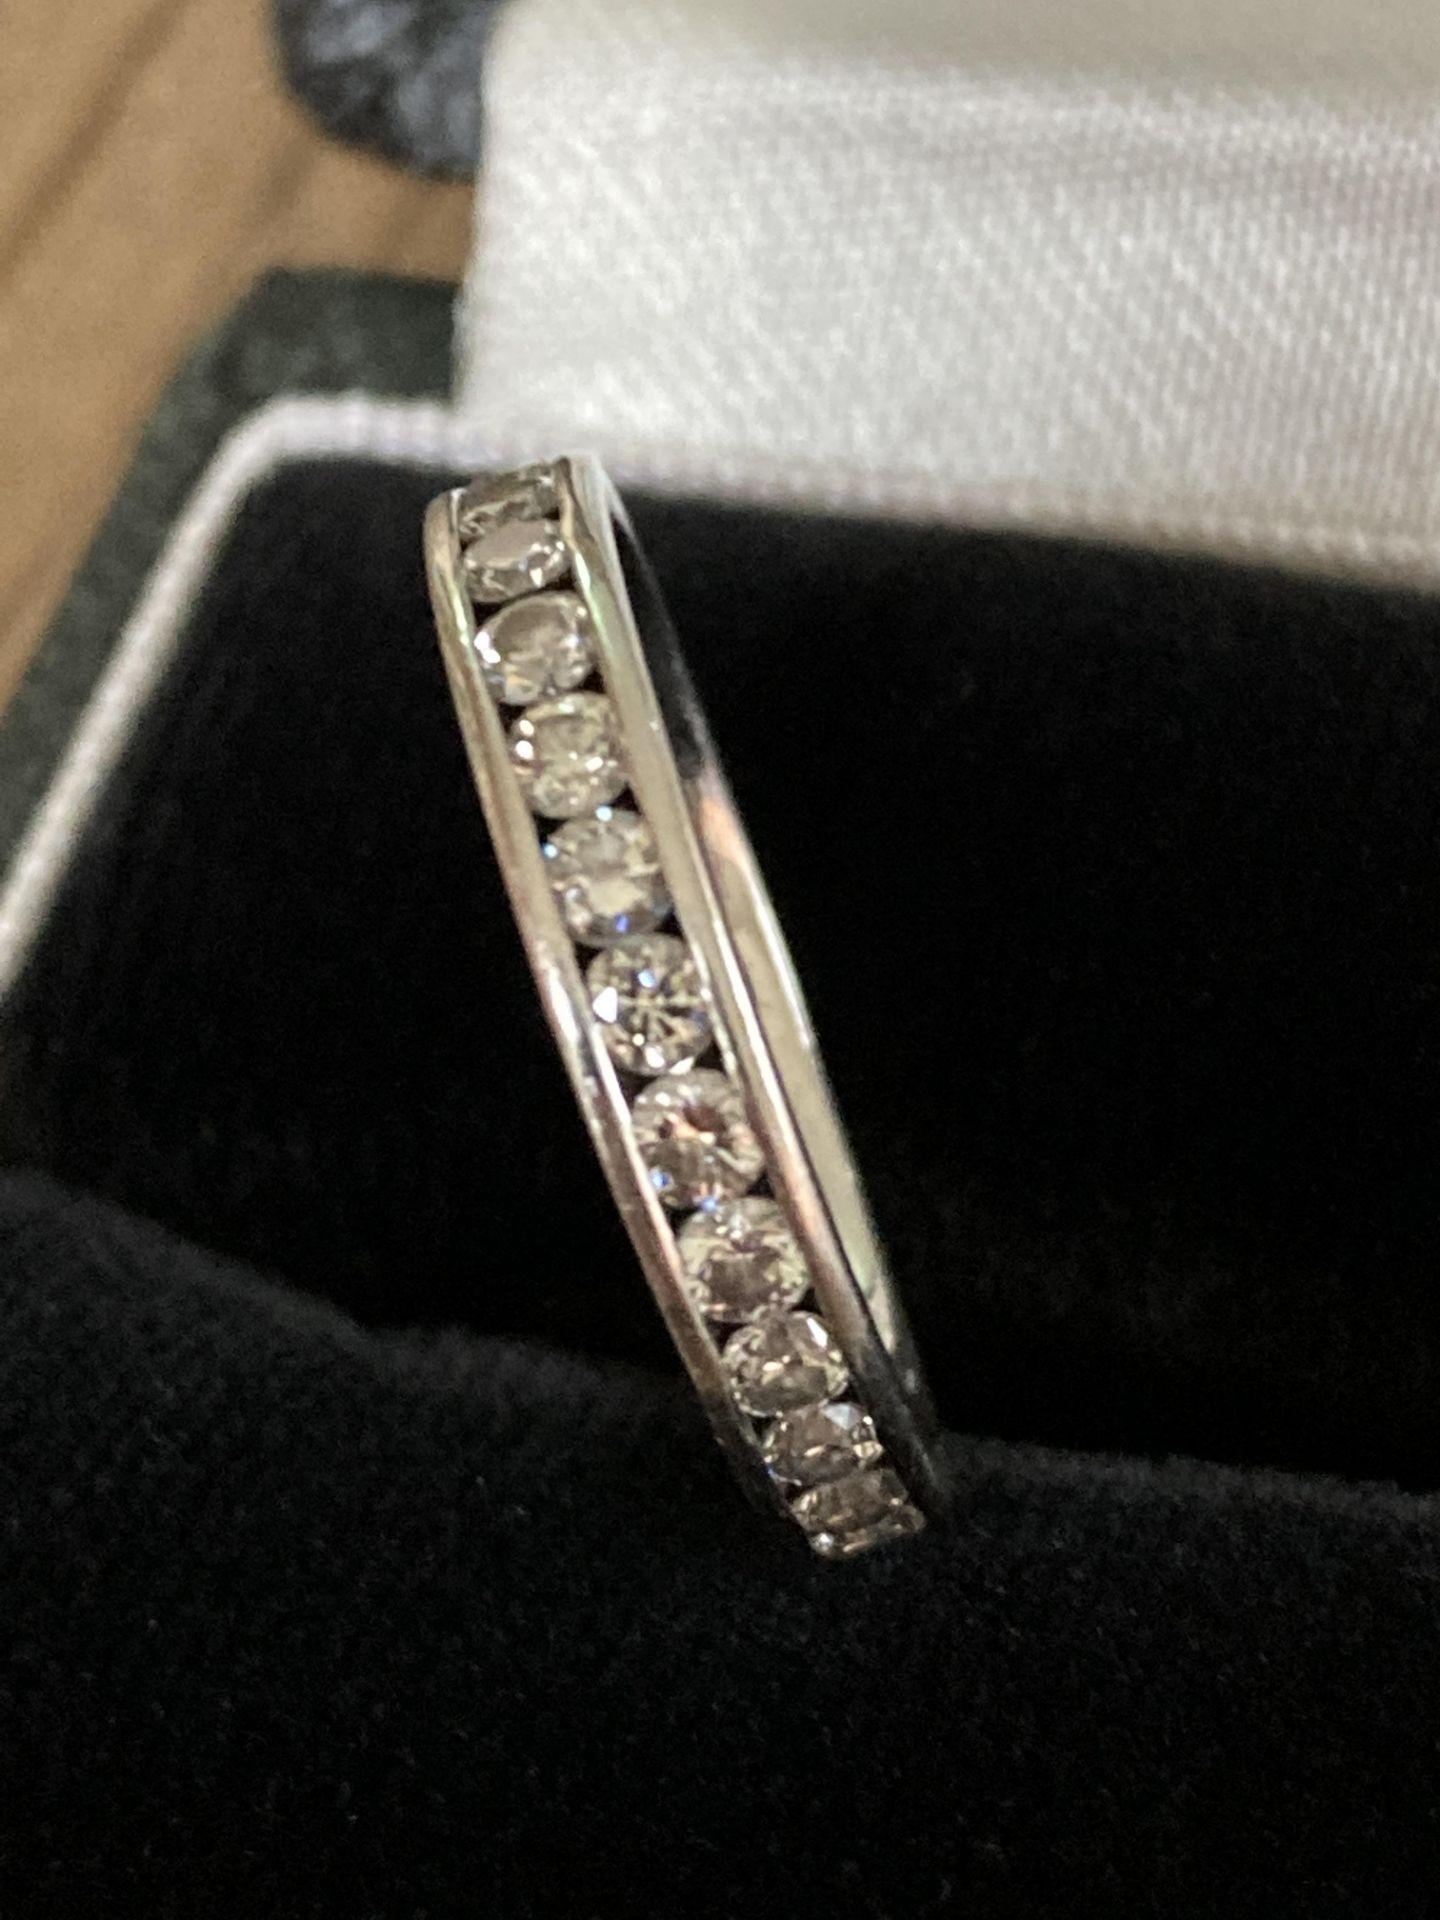 PLATINUM 0.57CT DIAMOND HALF ETERNITY RING (CHANNEL SET) - SIZE: J / WEIGHT: 3.9G - Image 2 of 2